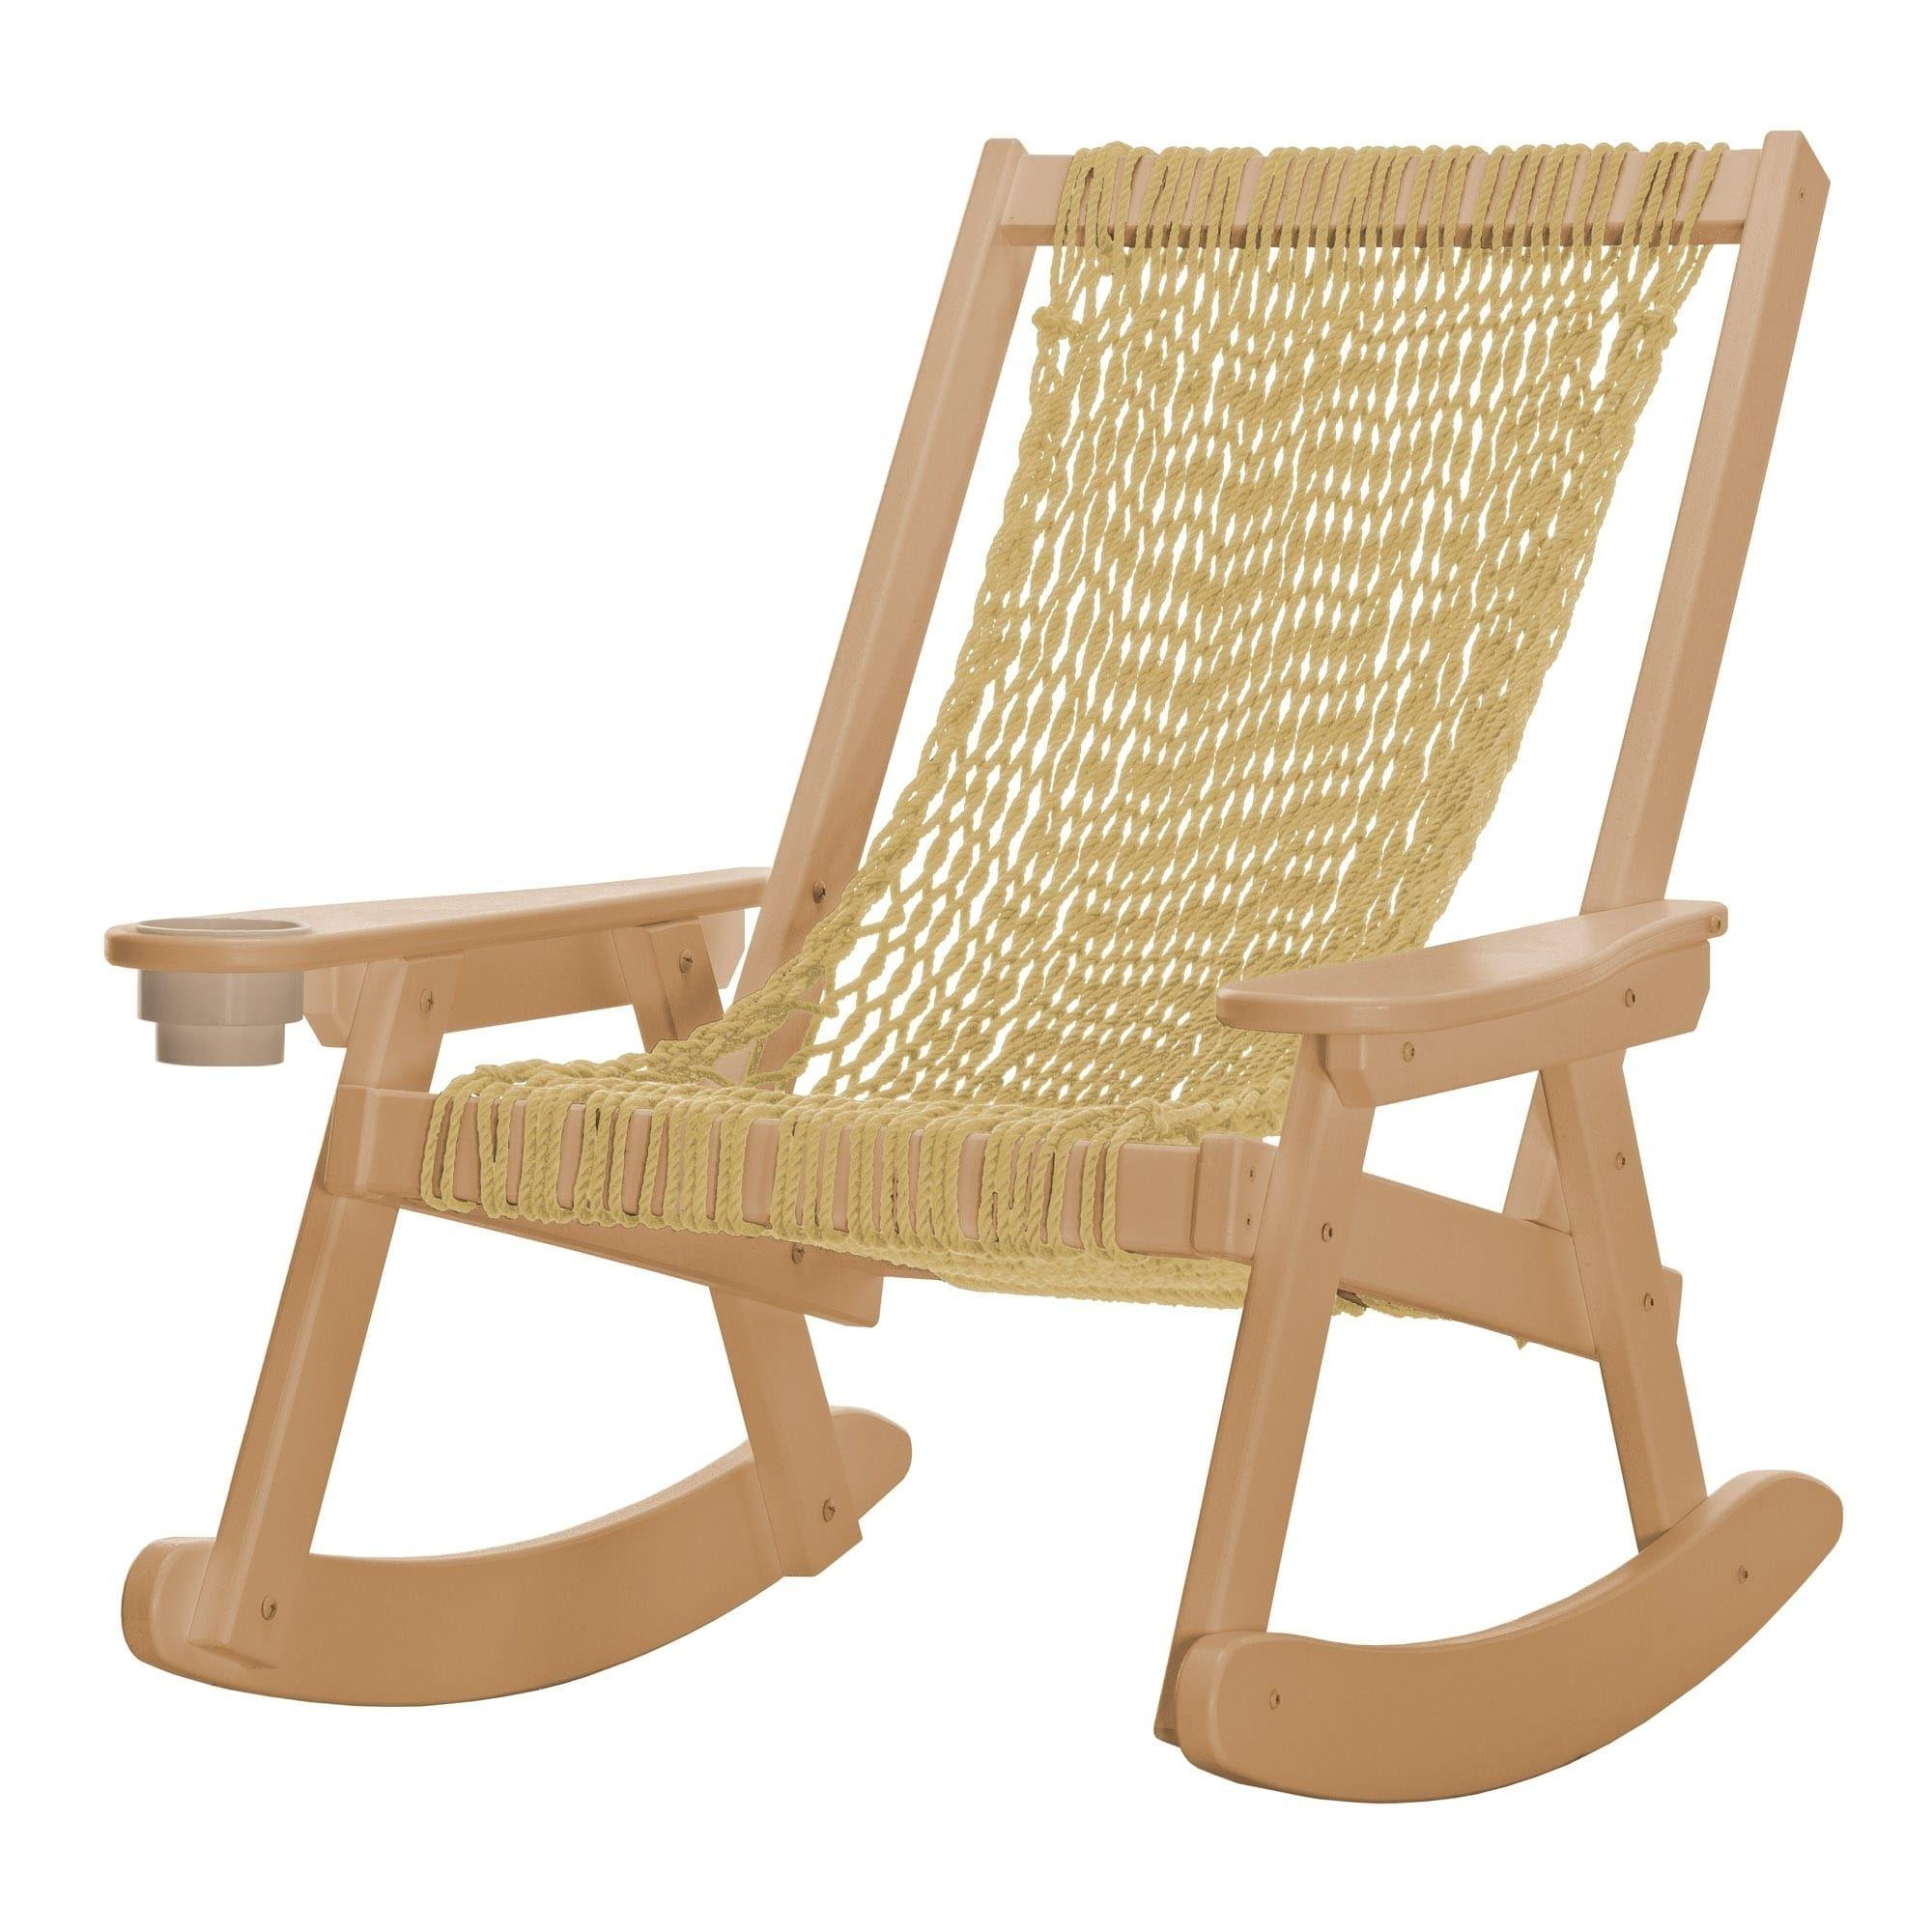 Pawleys island hammocks coastal duracord cedar rope rocker brown